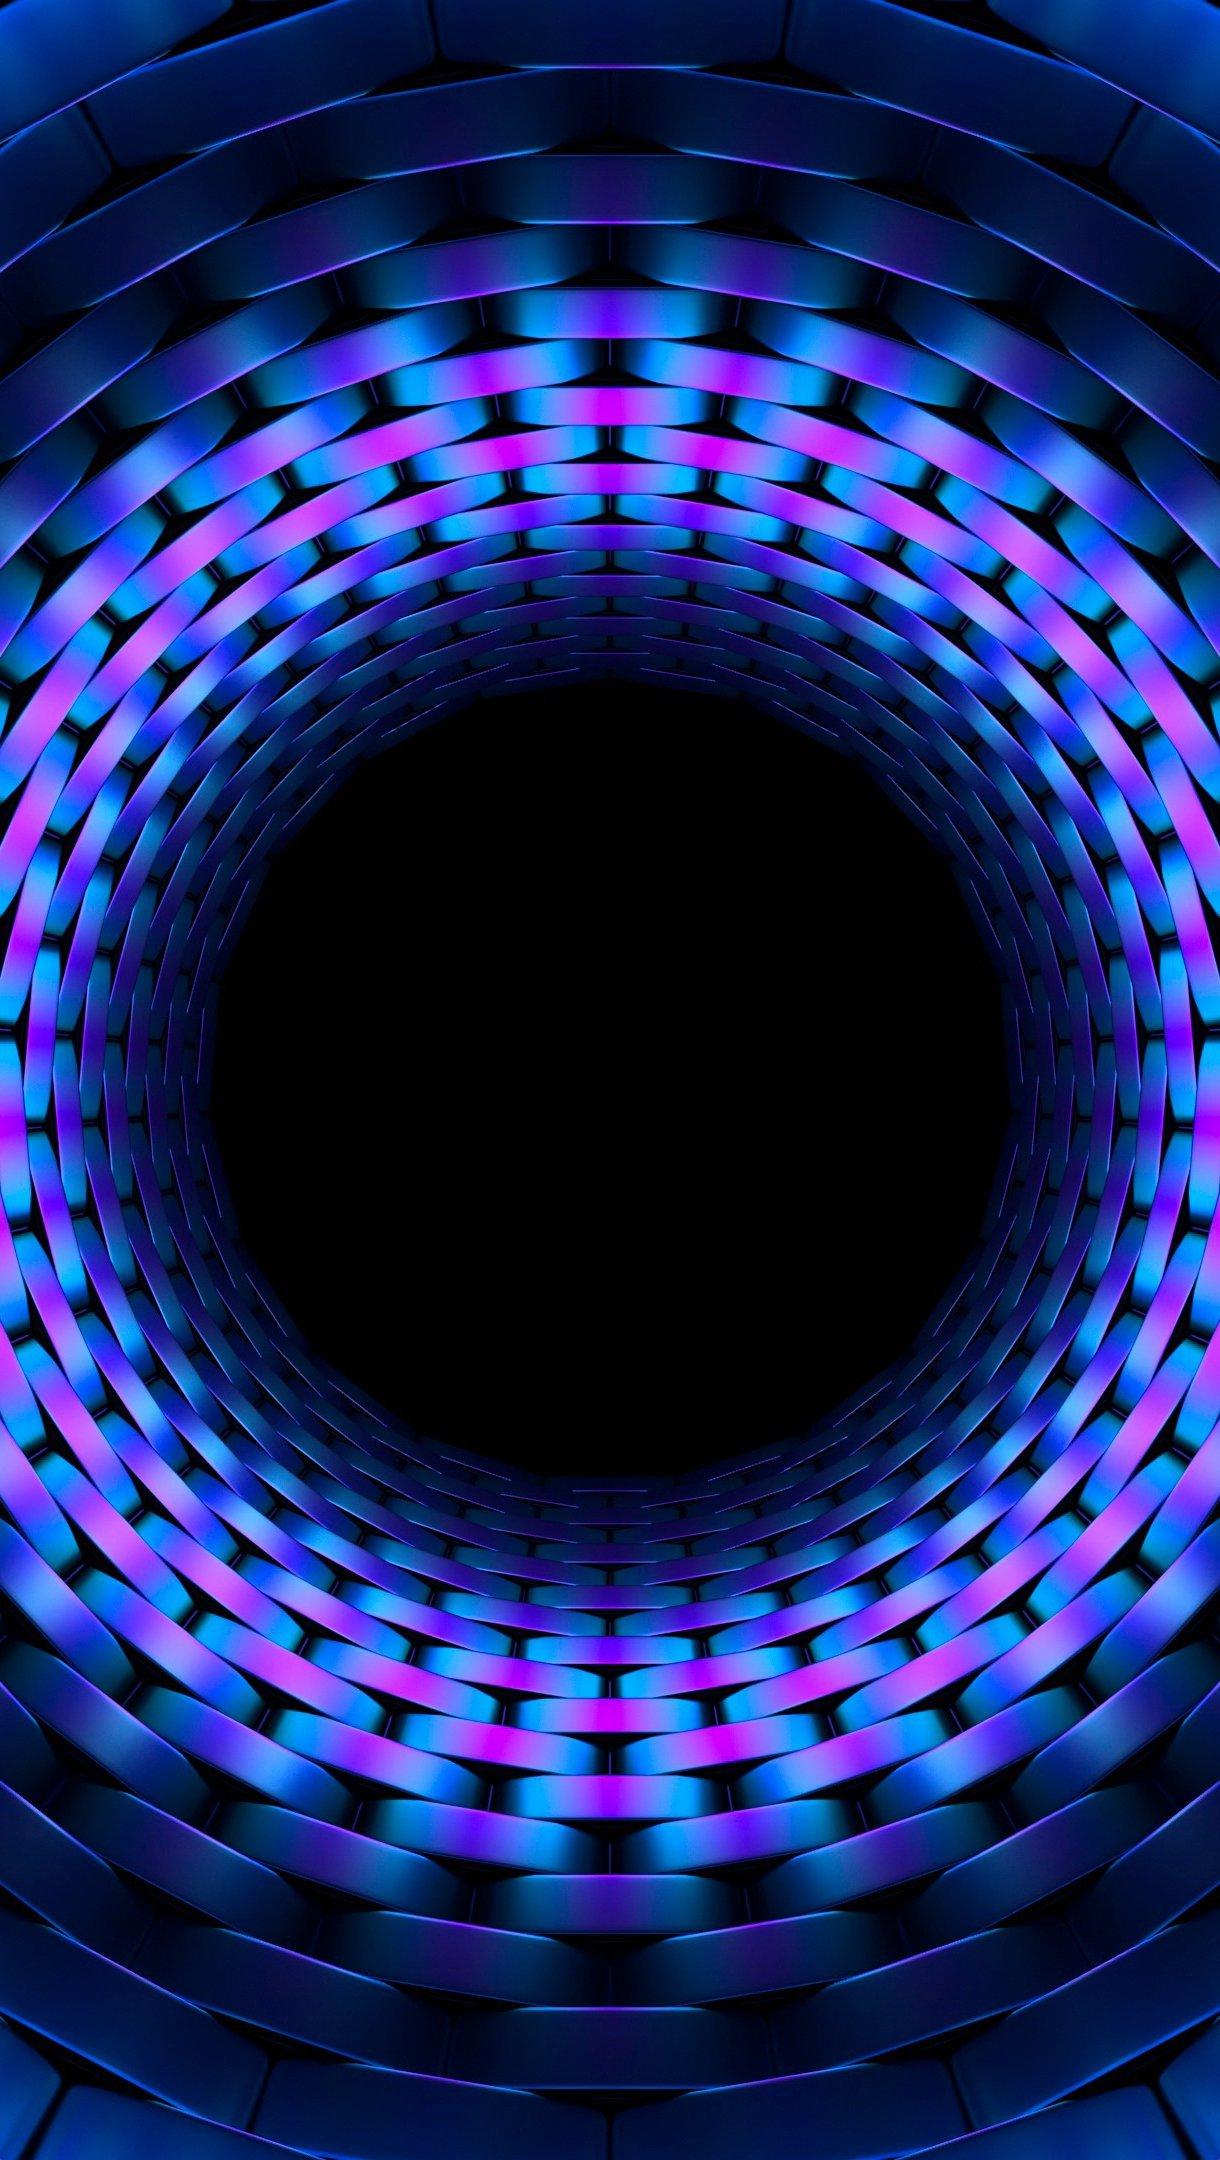 Fondos de pantalla Fractal de círculo en tunel azul 3D Vertical